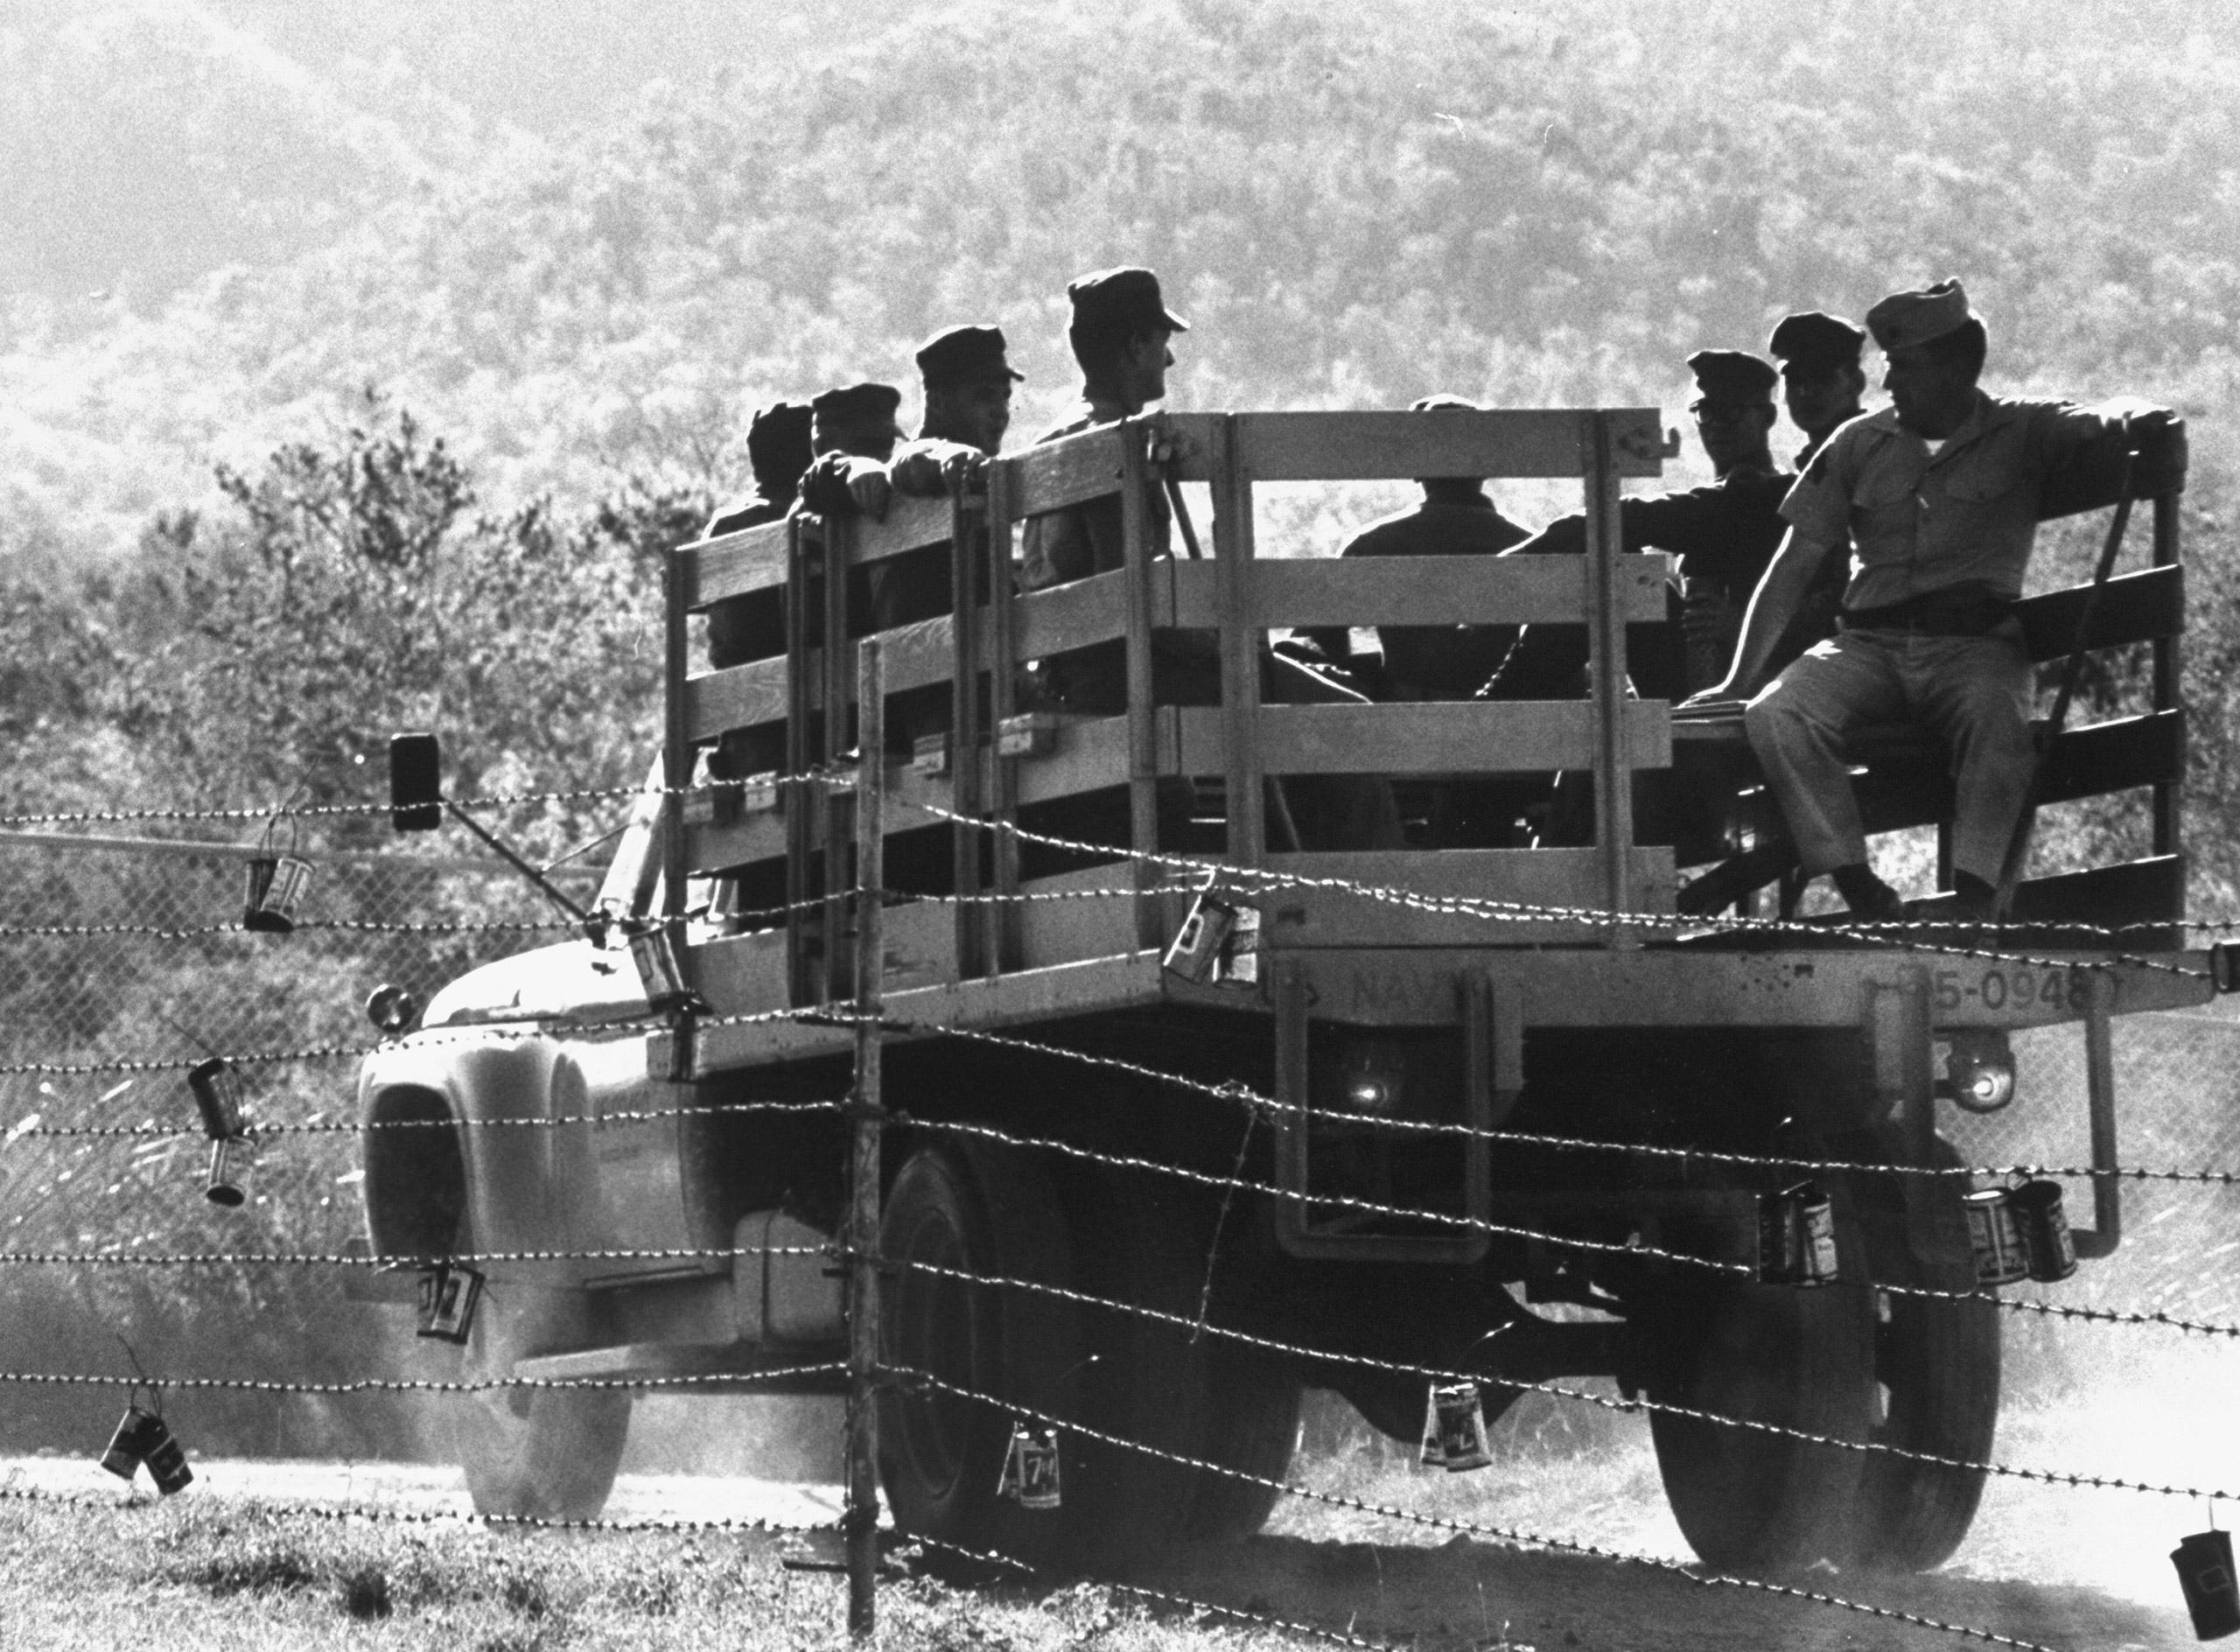 US truck carrying personnel at Guantanamo Naval Base, Guantanamo Bay, Cuba, 1962.